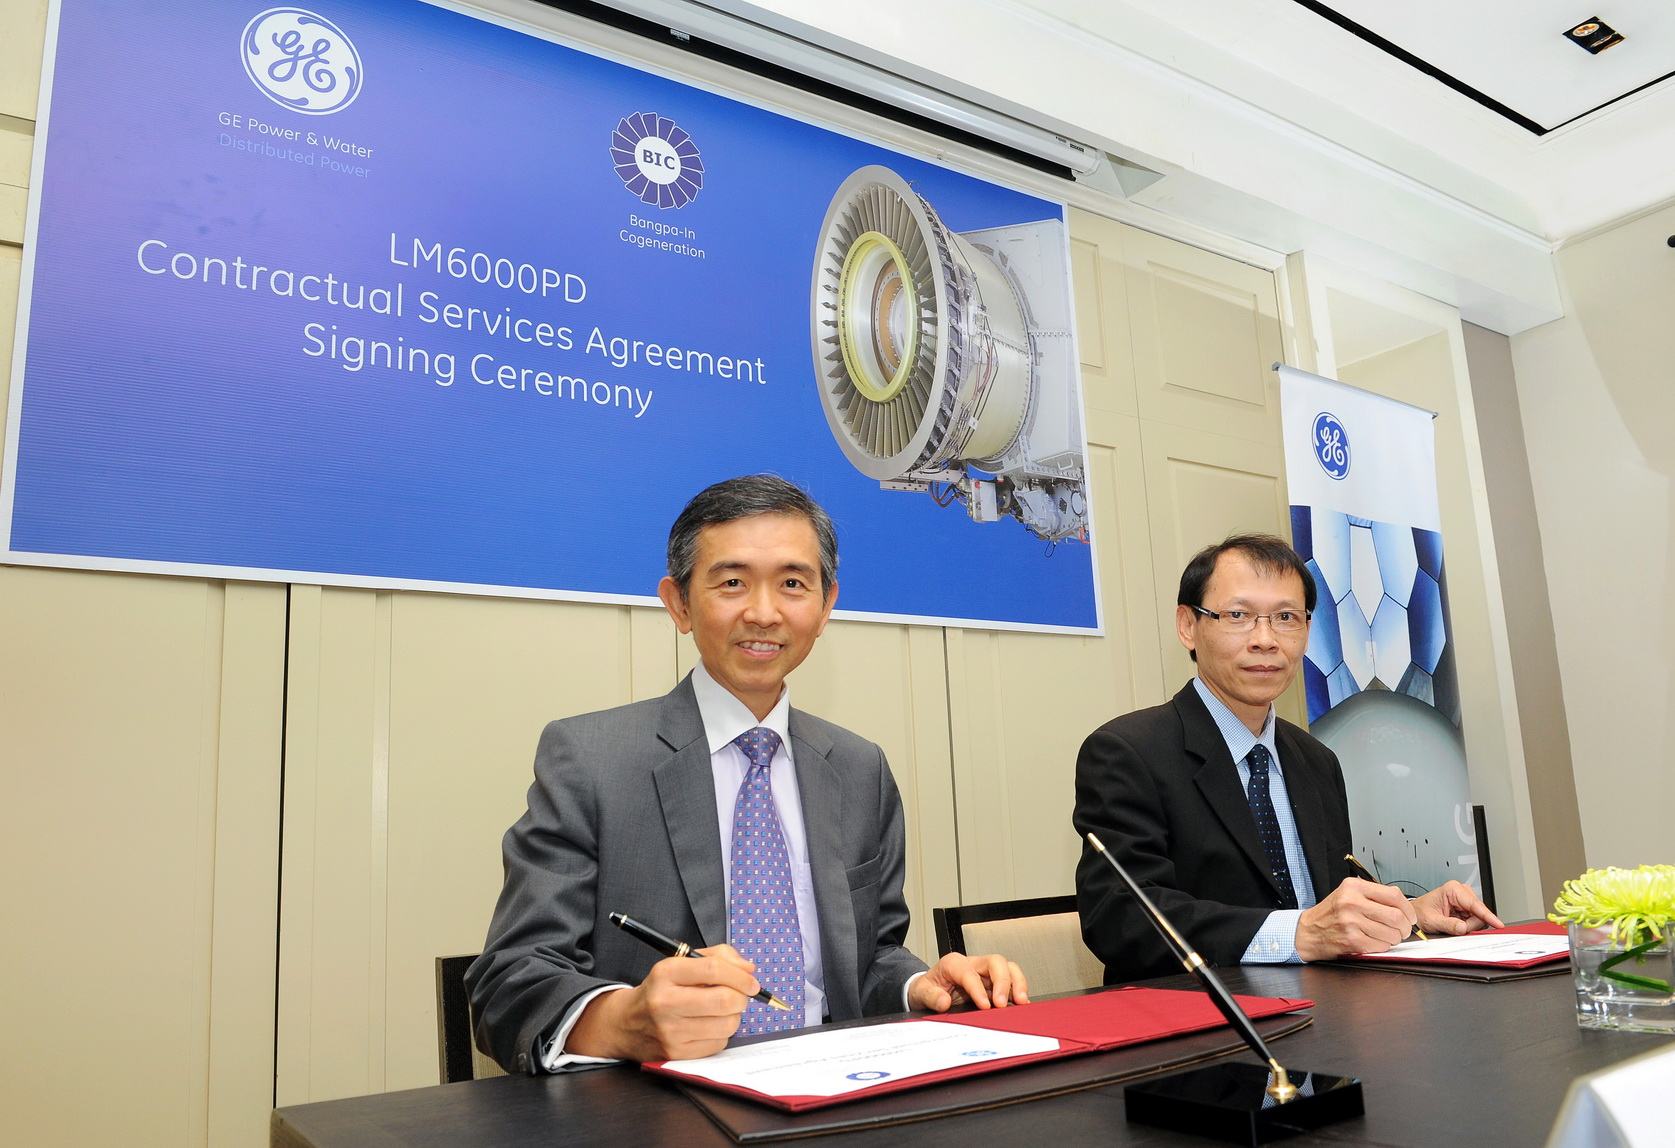 GE, Bangpa-In Cogeneration Sign Aeroderivative Service